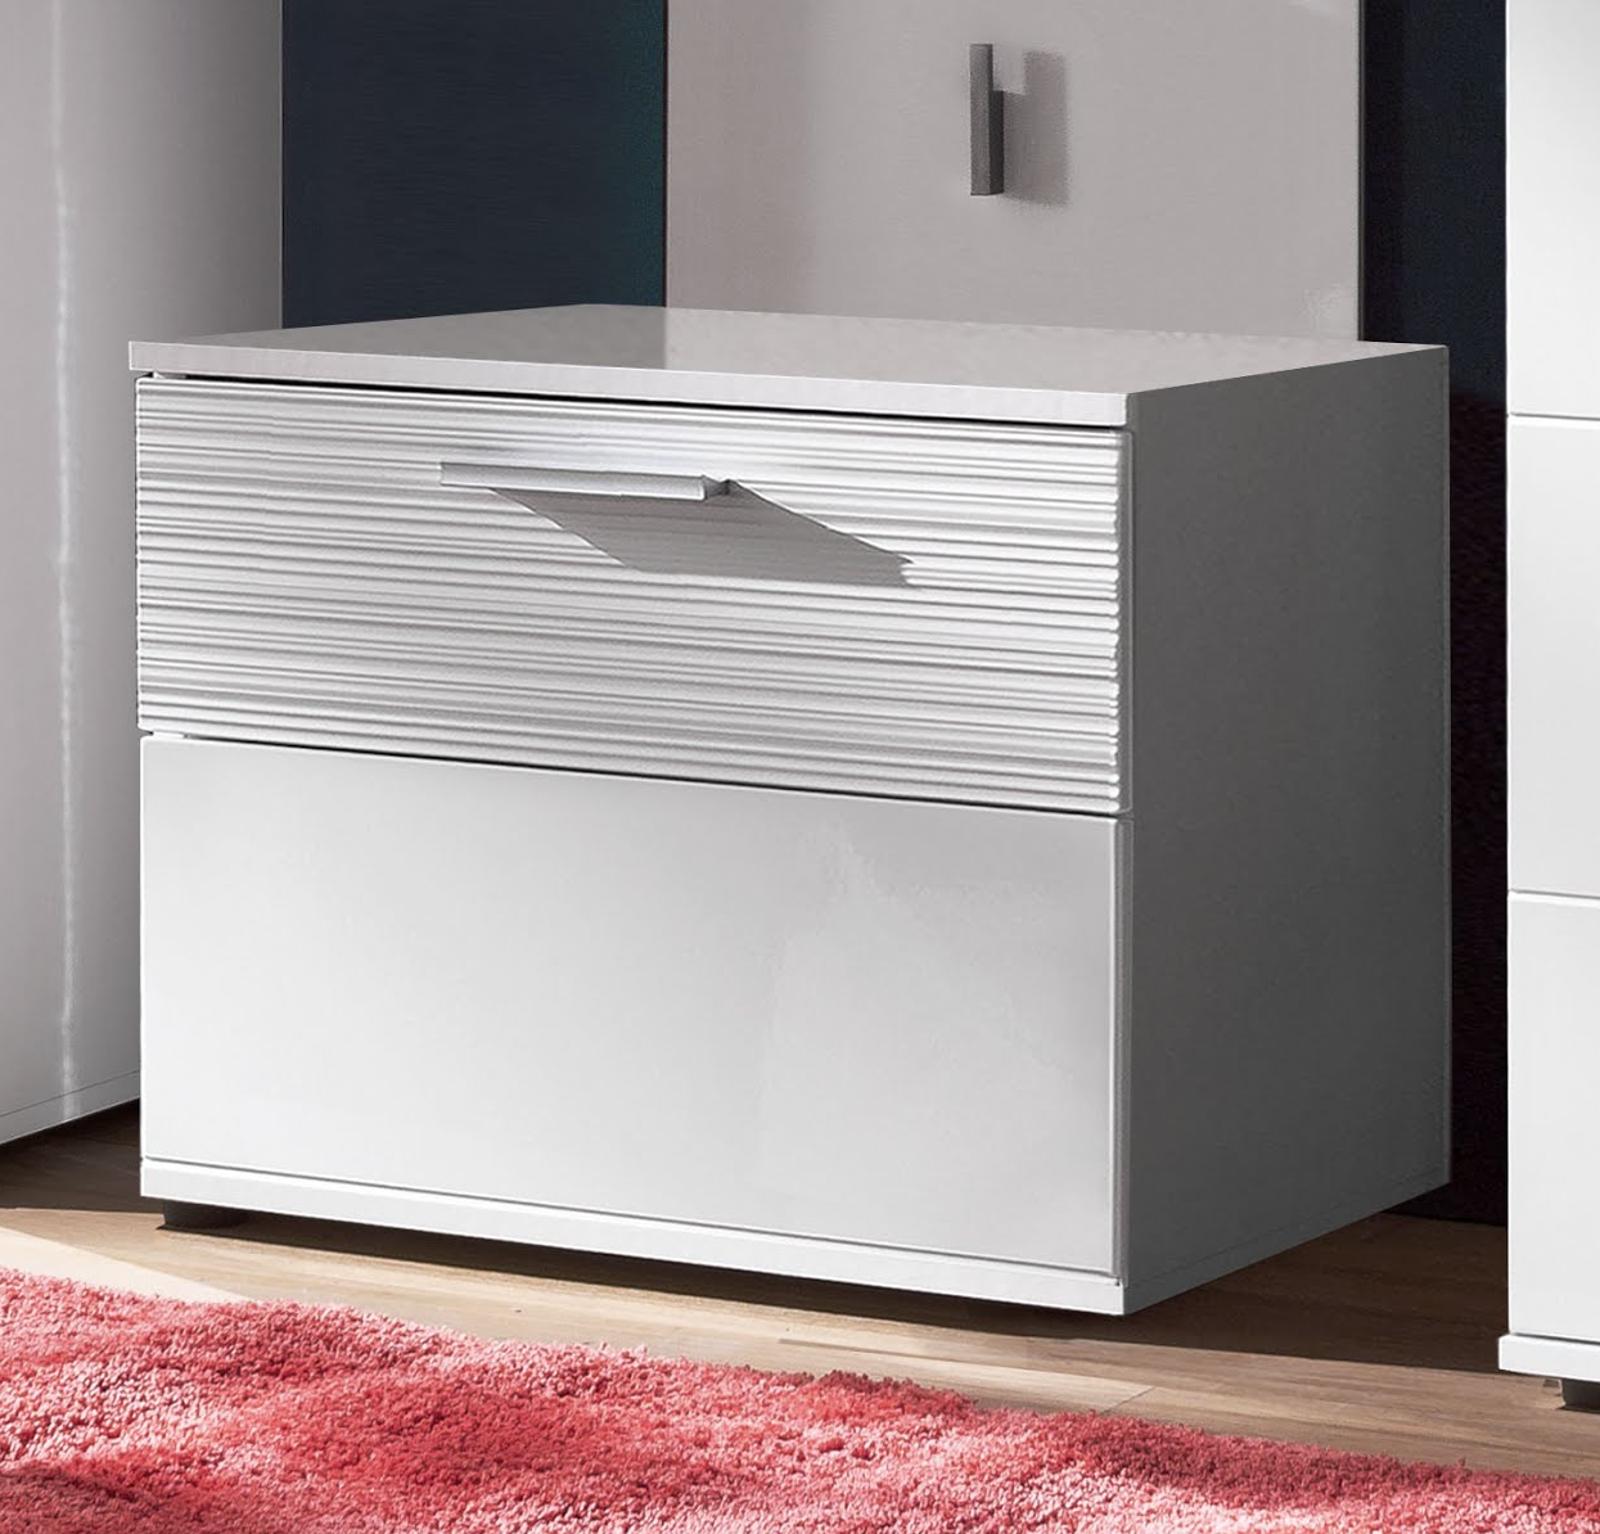 sitzbank schuhbank garderobenbank wei hochglanz bank 60. Black Bedroom Furniture Sets. Home Design Ideas